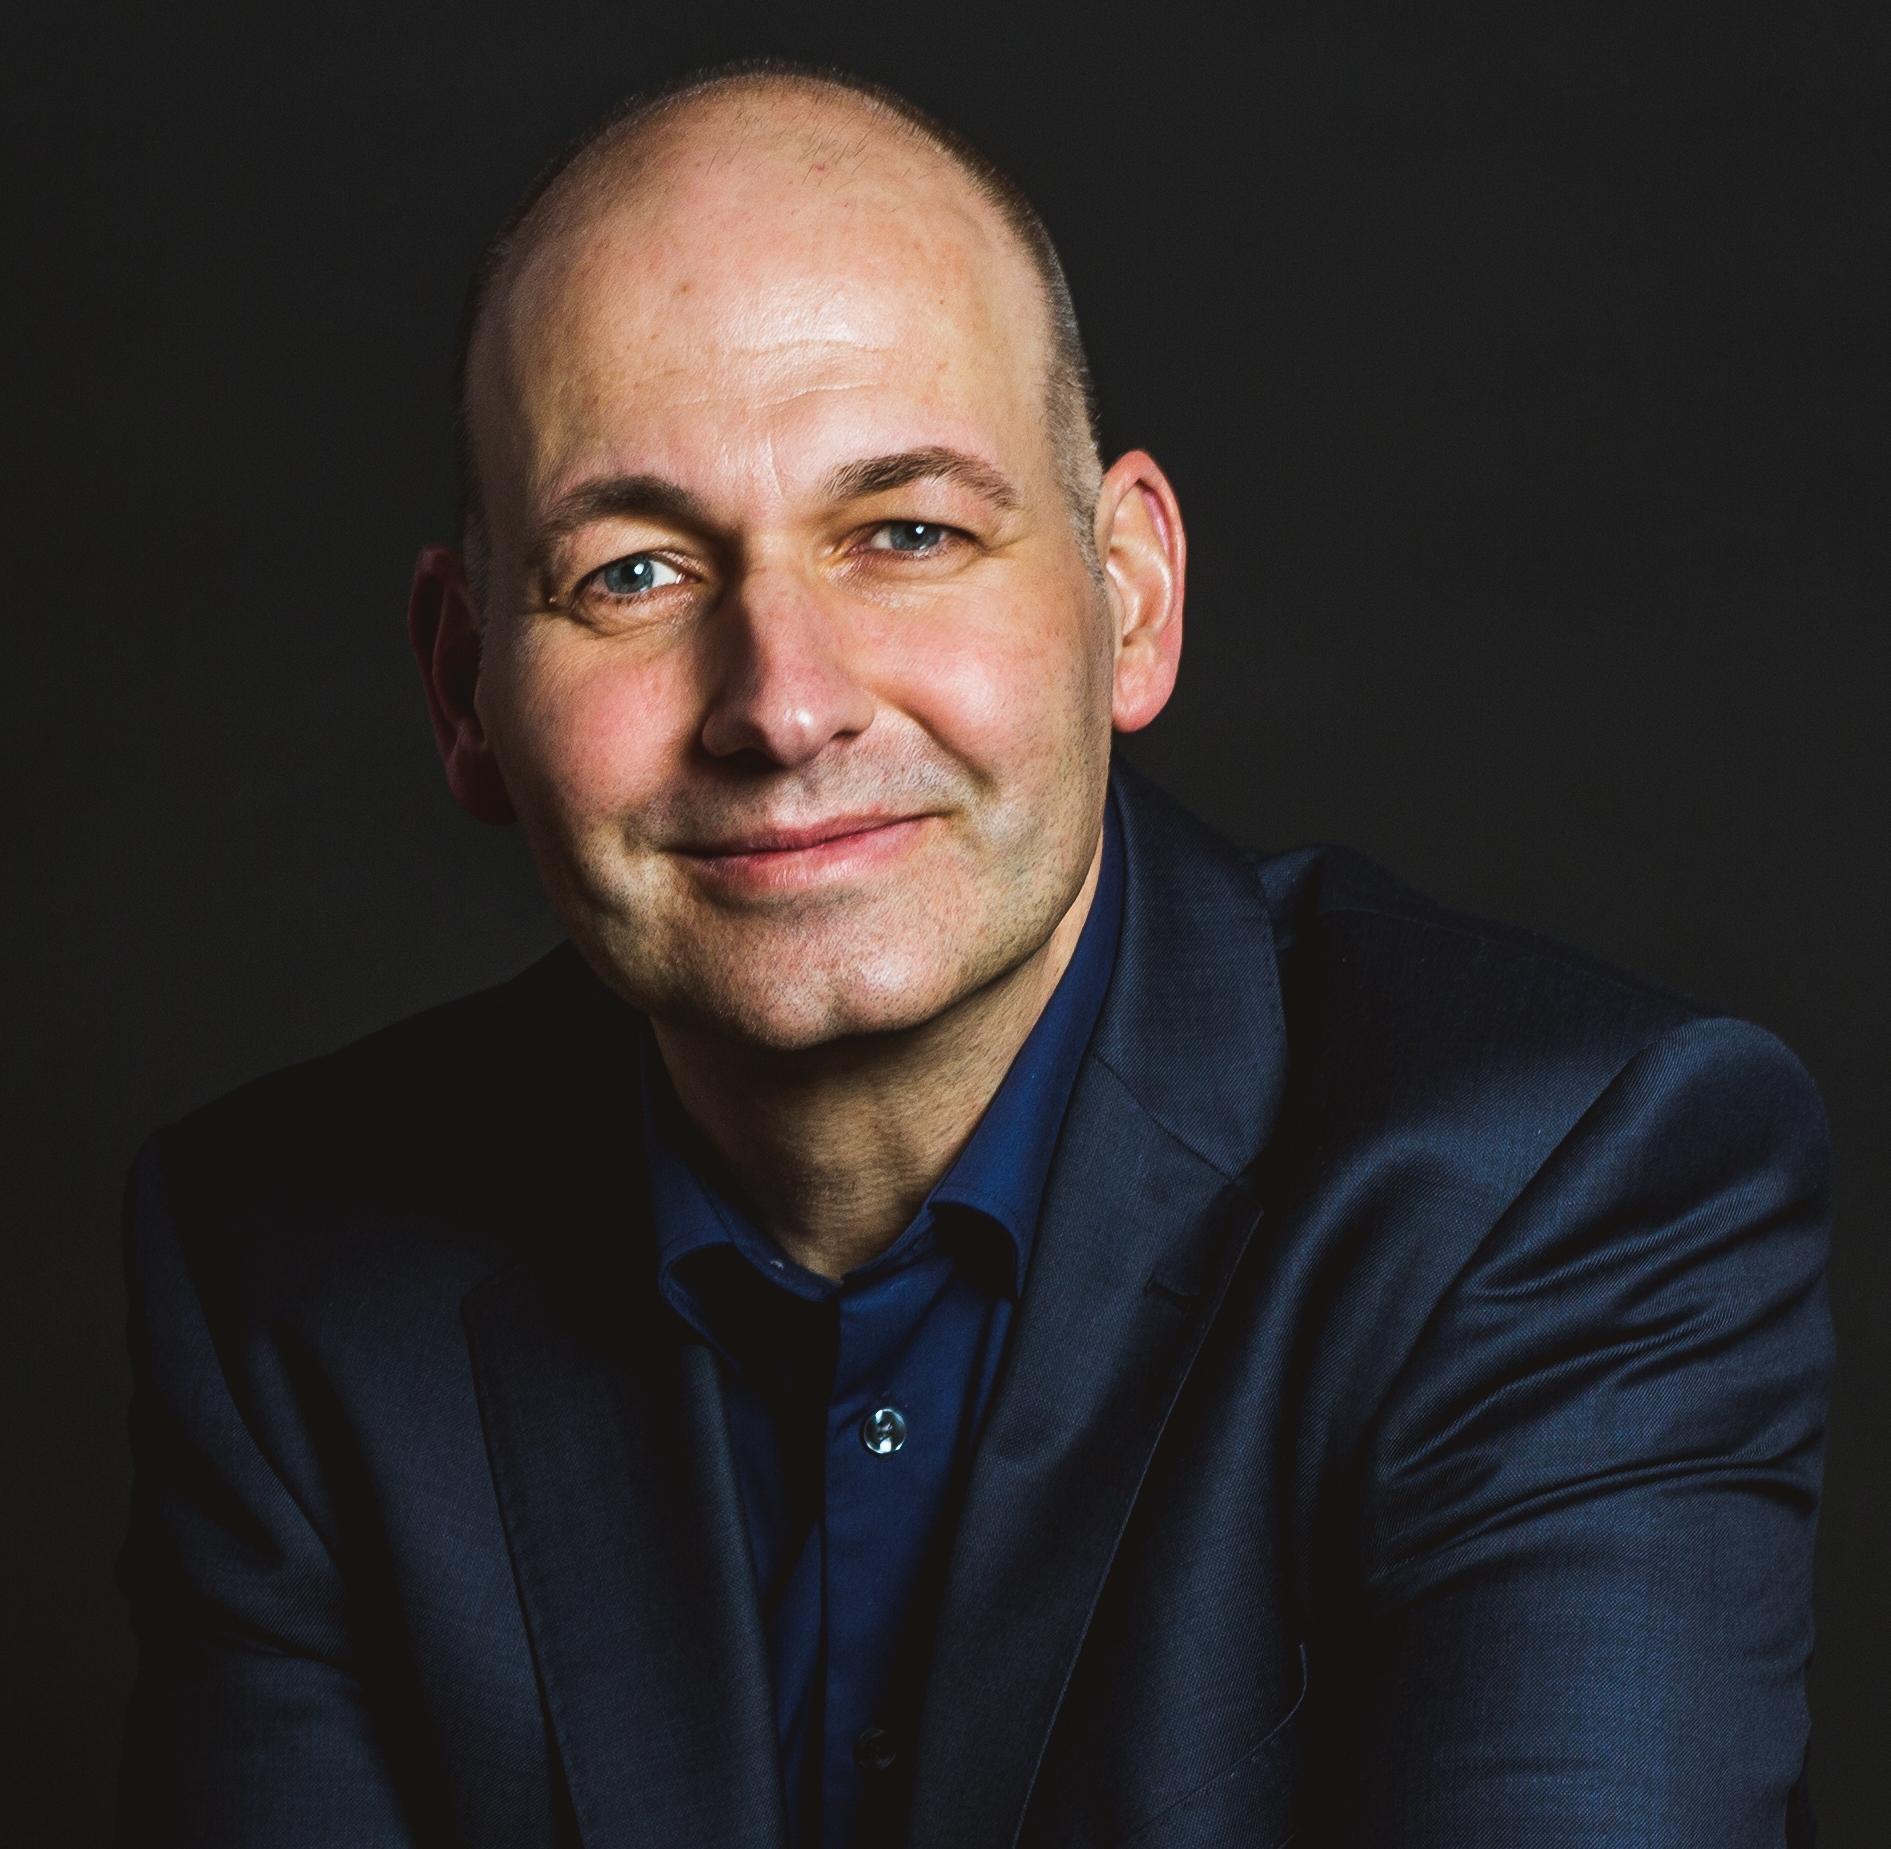 Frank Marco Günzel